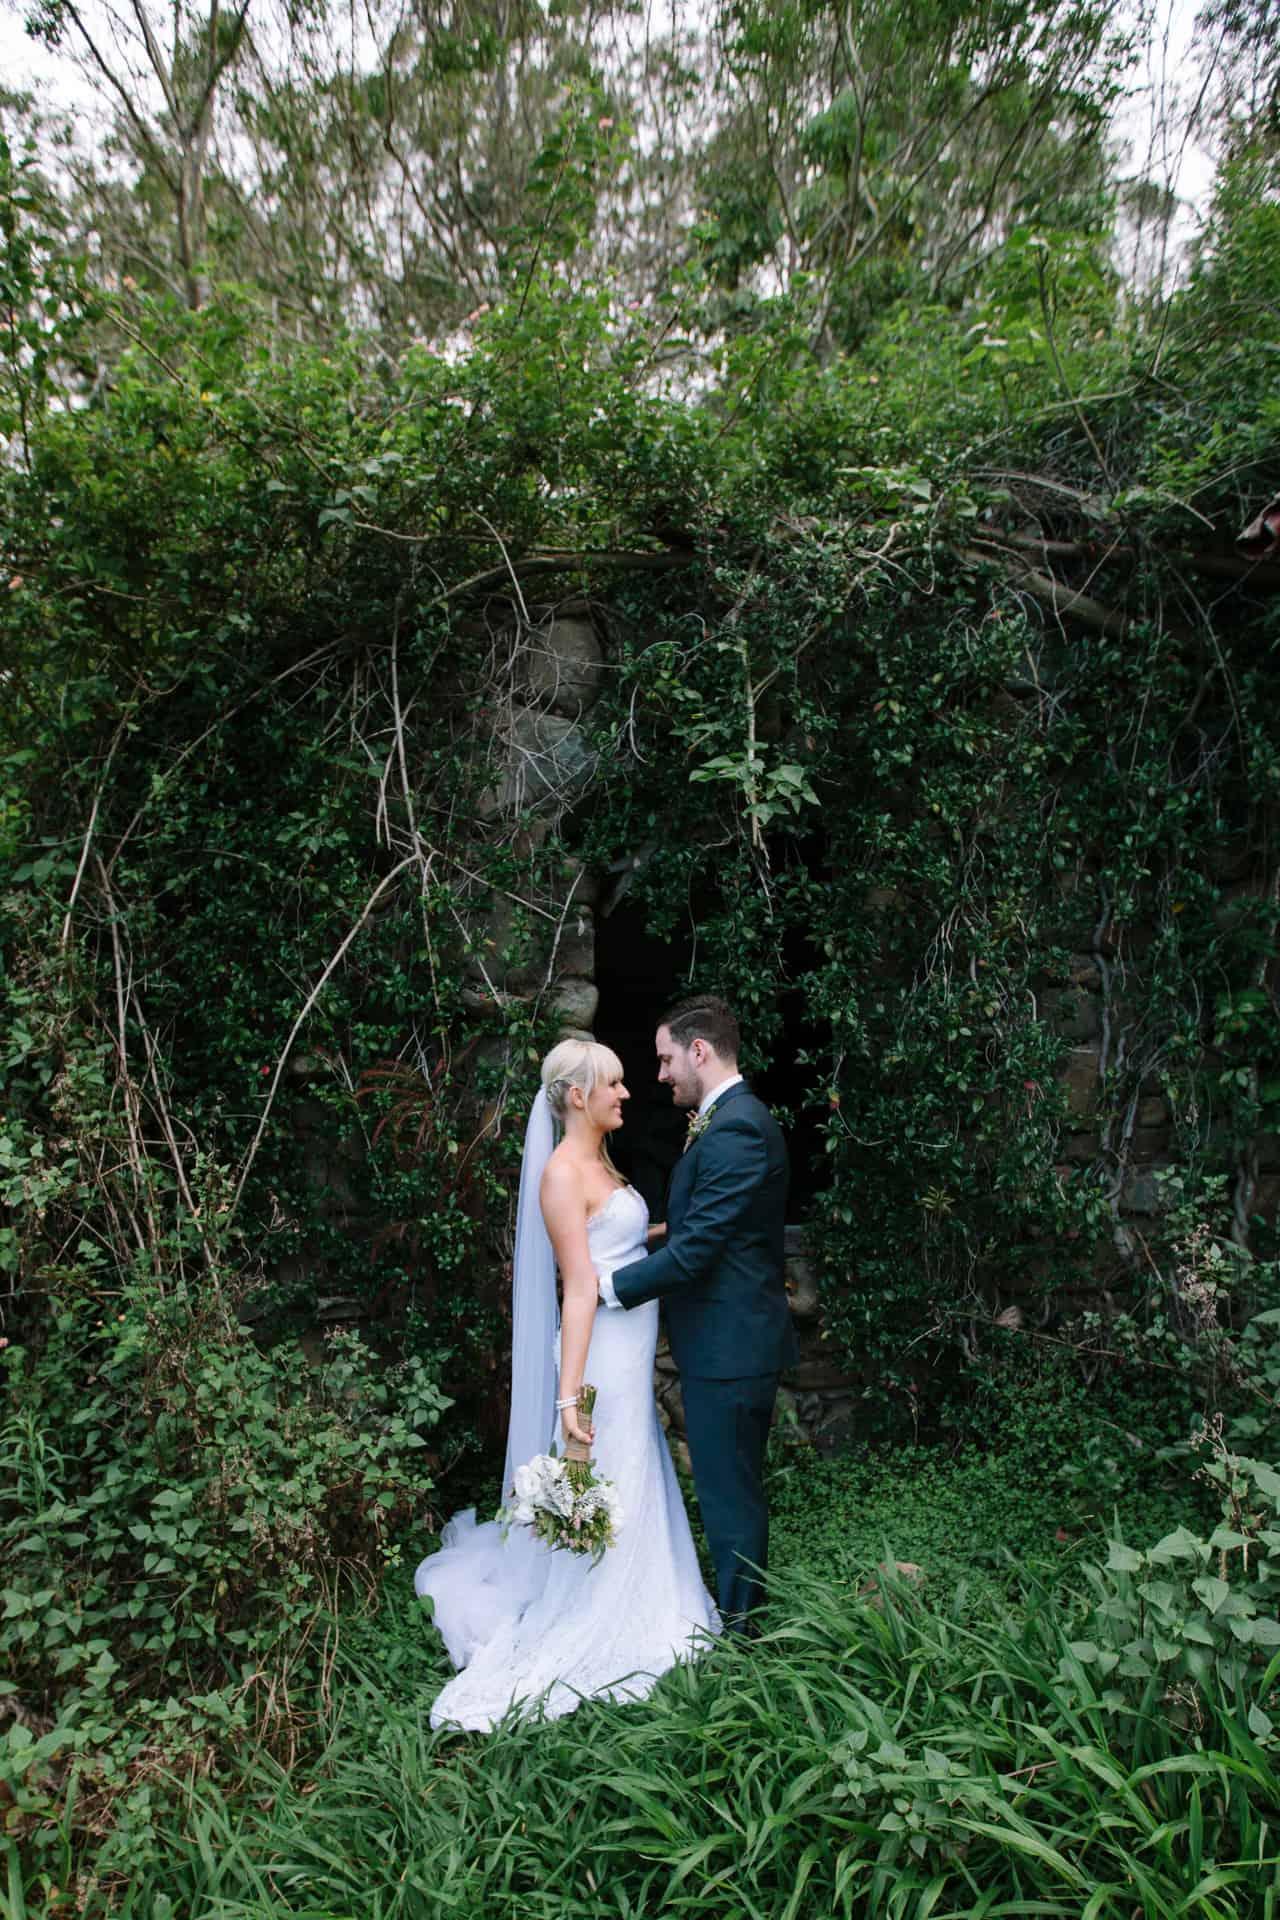 Danielle & Richard | Real Weddings Queensland